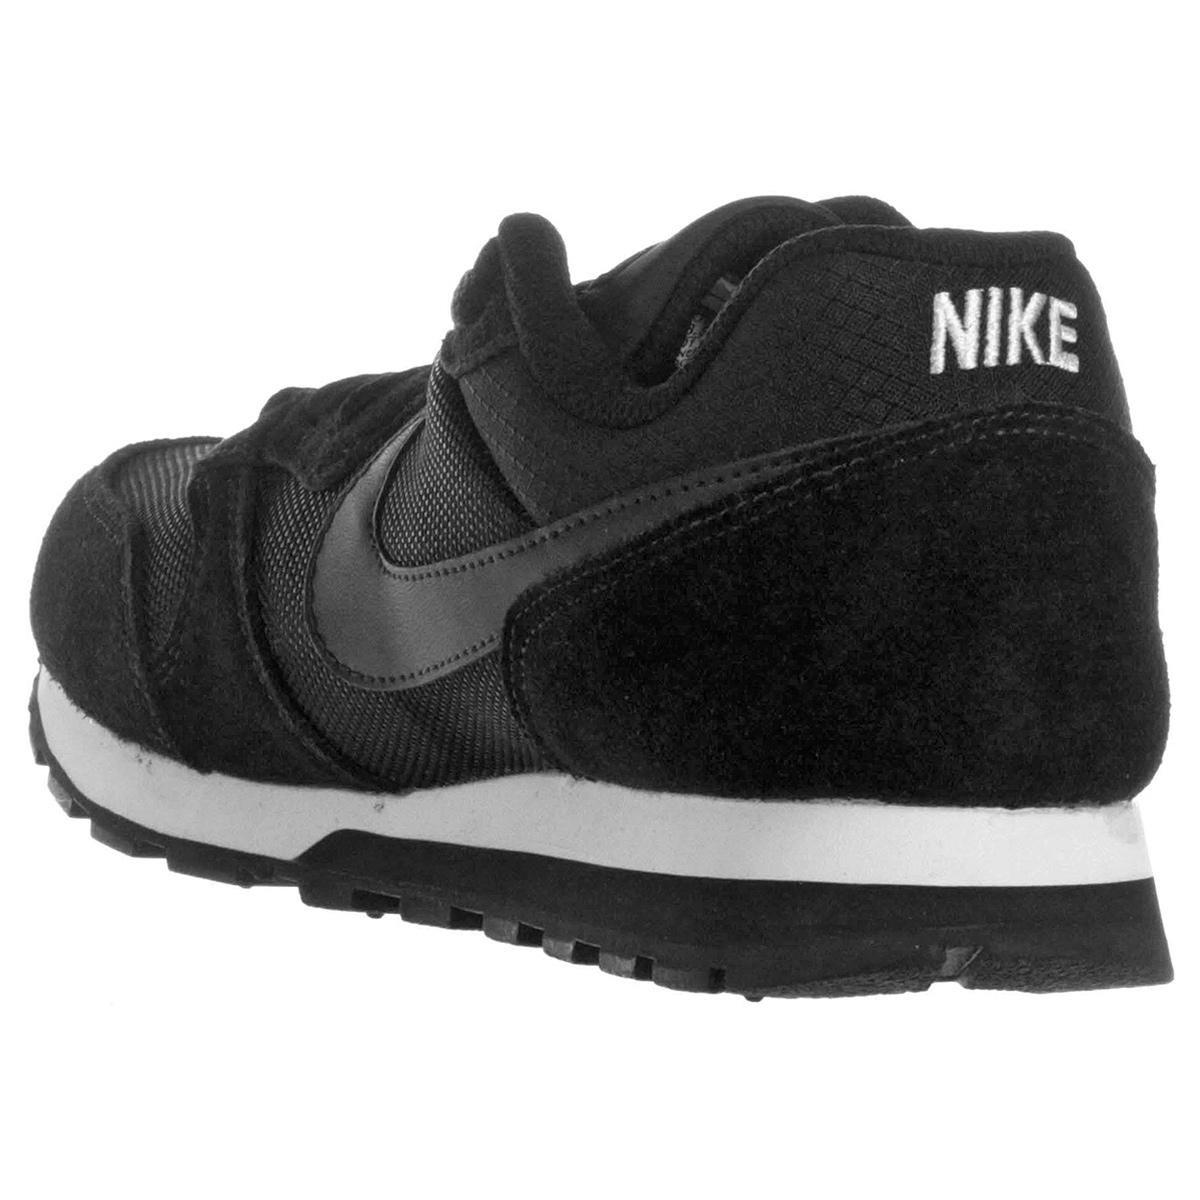 Tênis Nike Md Runner 2 Feminino Preto E Branco